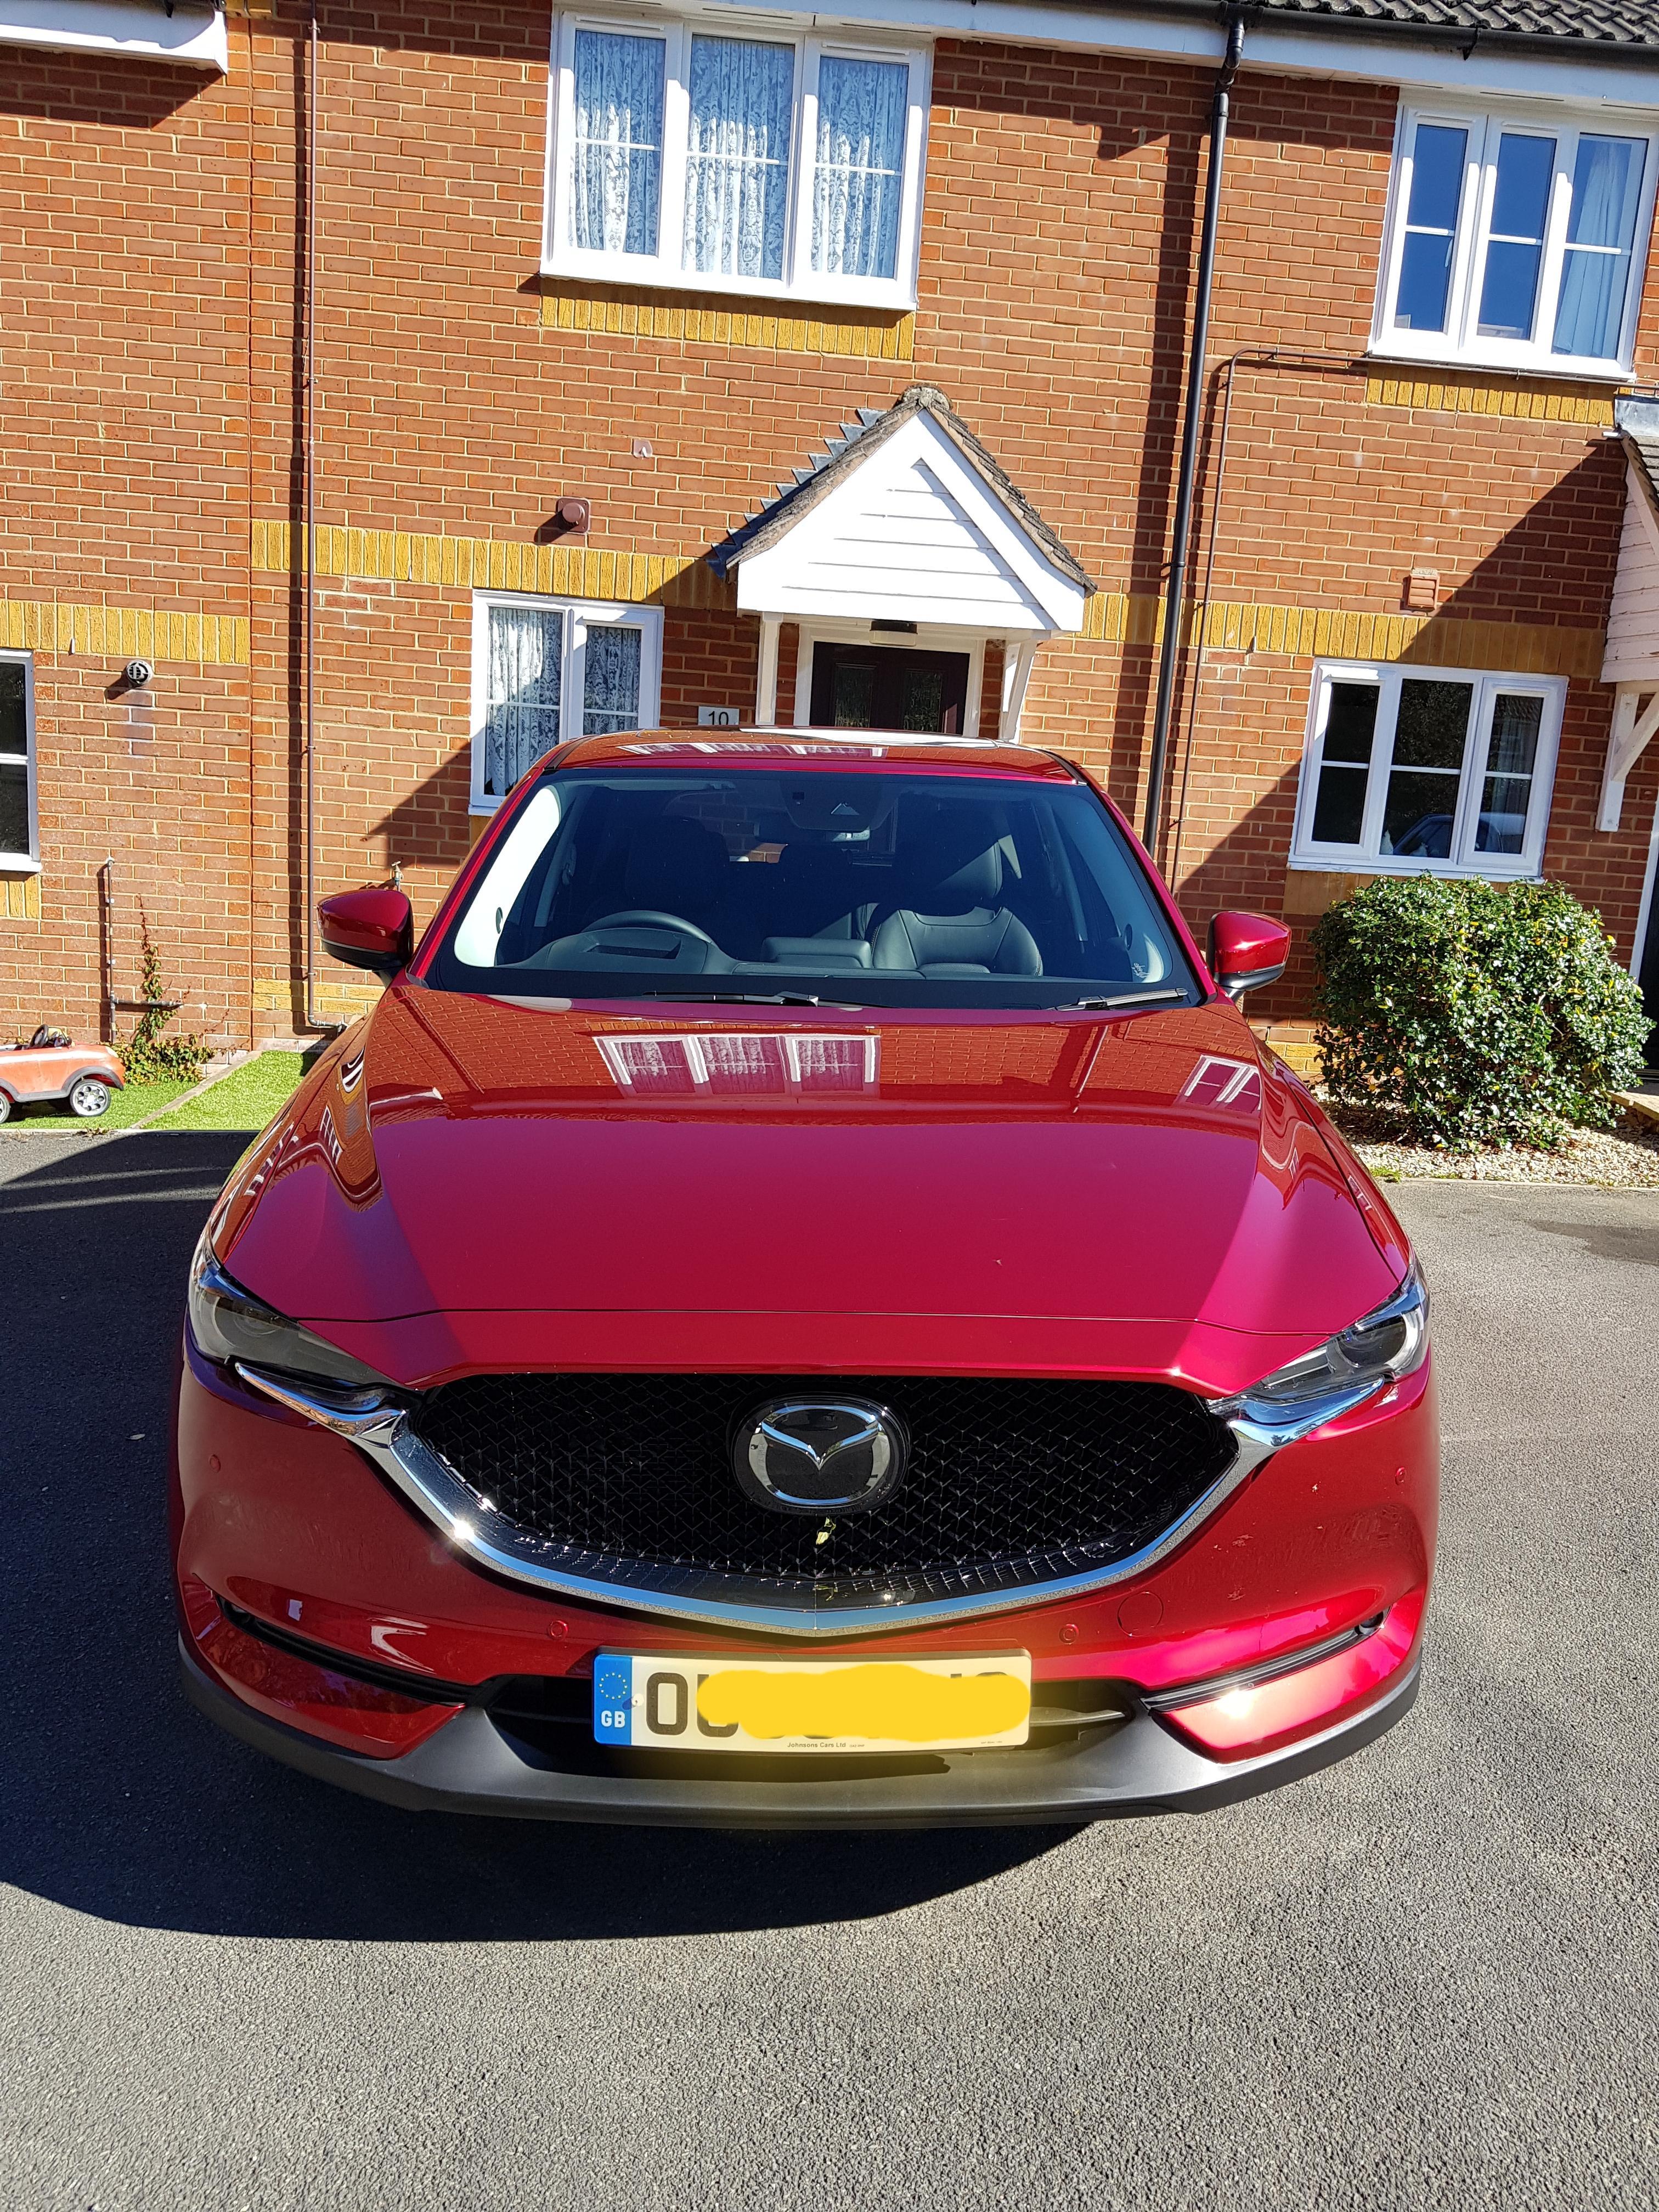 Kensi My New Mazda Cx 5 Sport Nav 2 0 Petrol Which Mobility Car